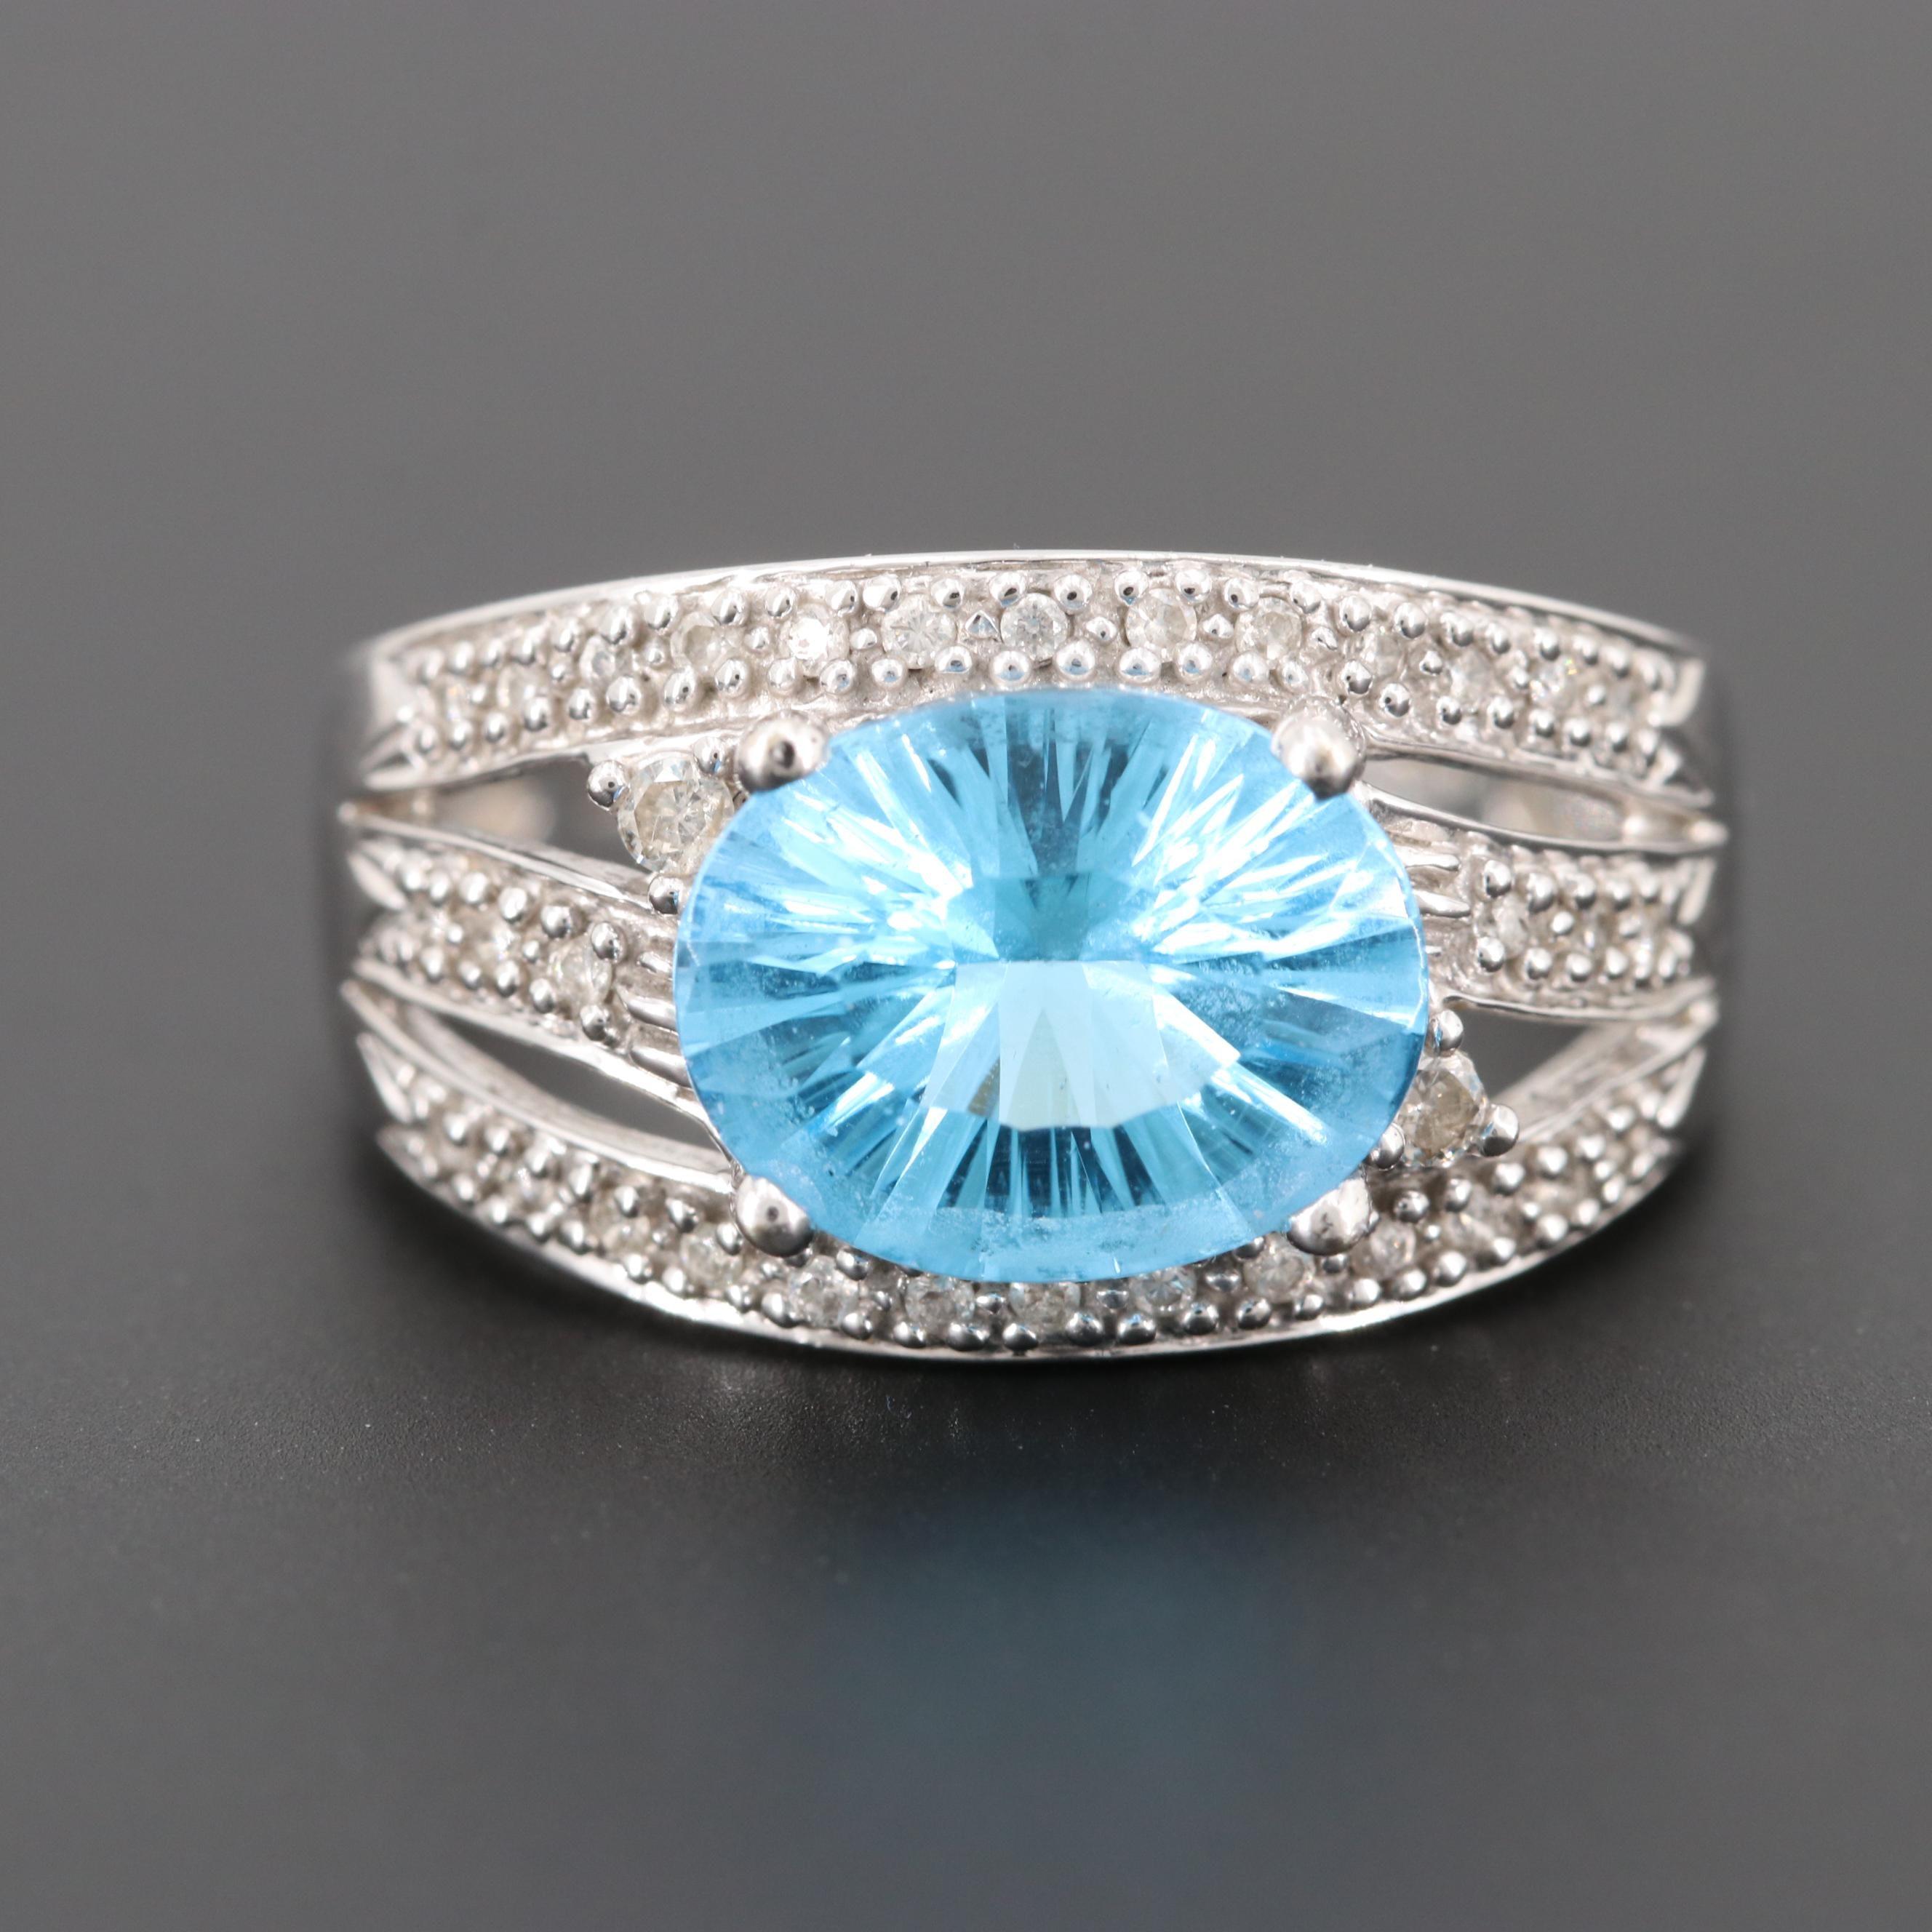 Le Vian 14K White Gold Blue Topaz and Diamond Ring